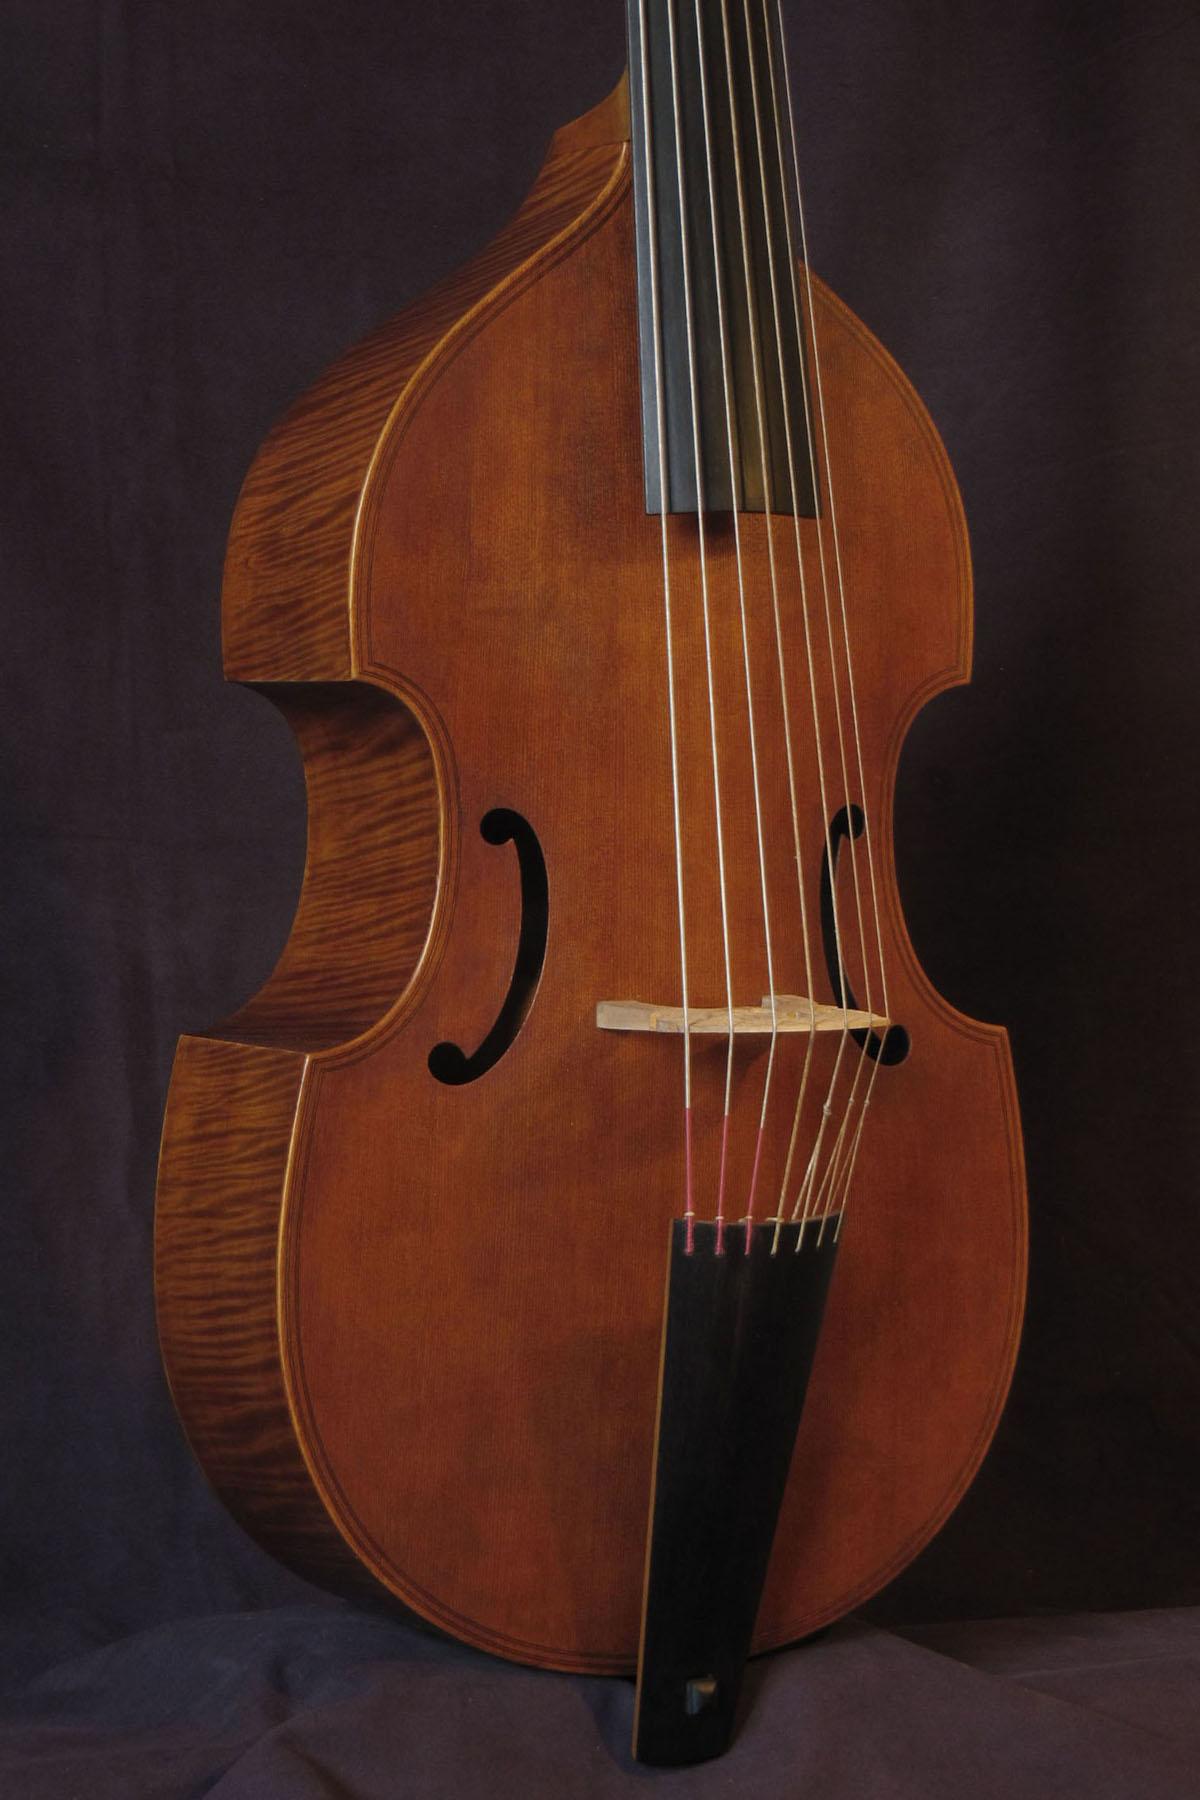 Viola bajo modelo R. Cheron